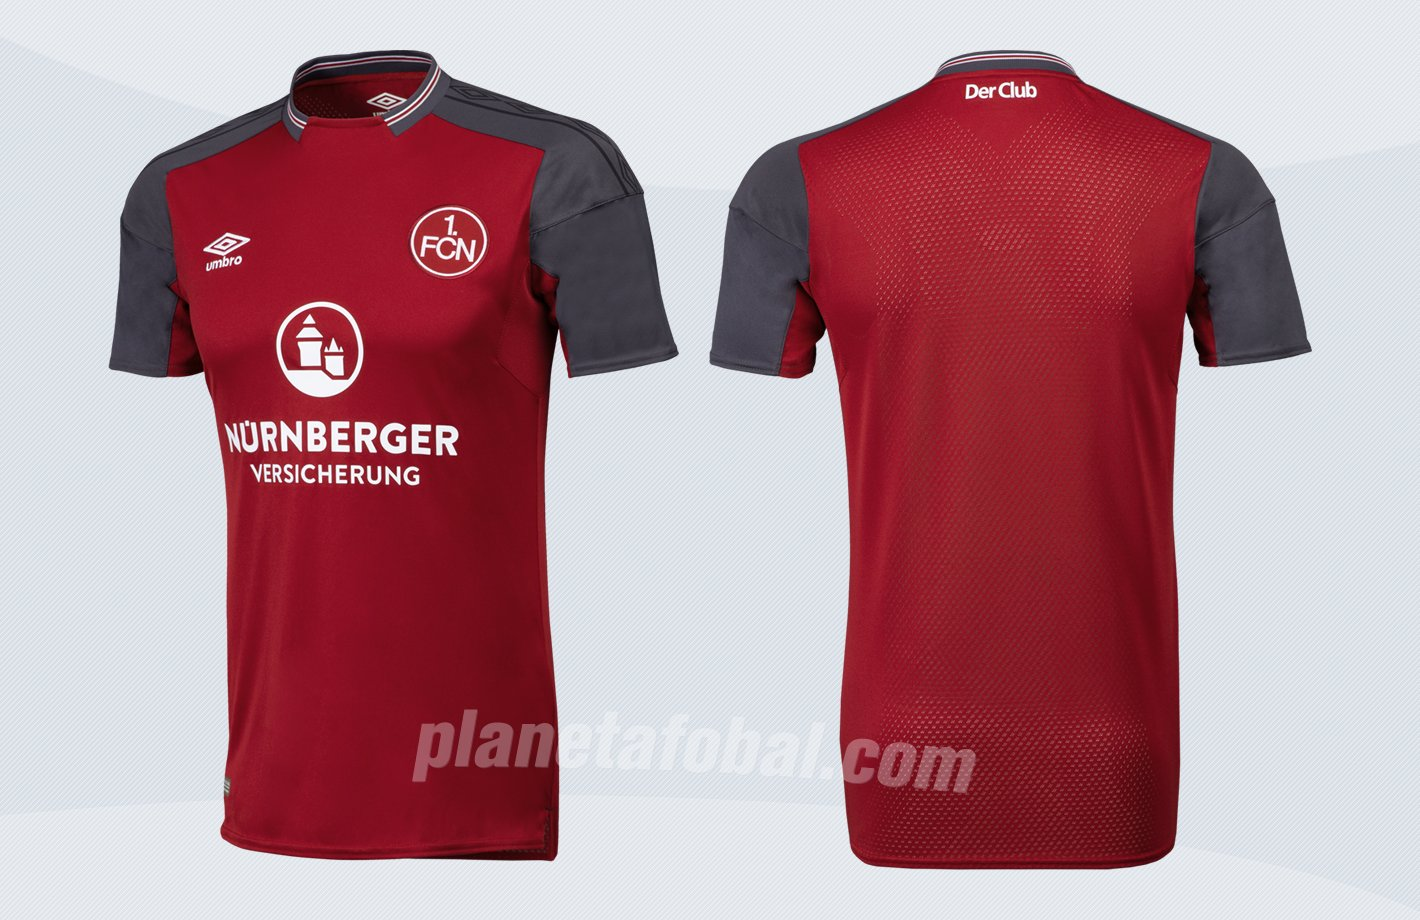 Camiseta titular Umbro 2017-18 del FC Nürnberg | Imágenes Web Oficial